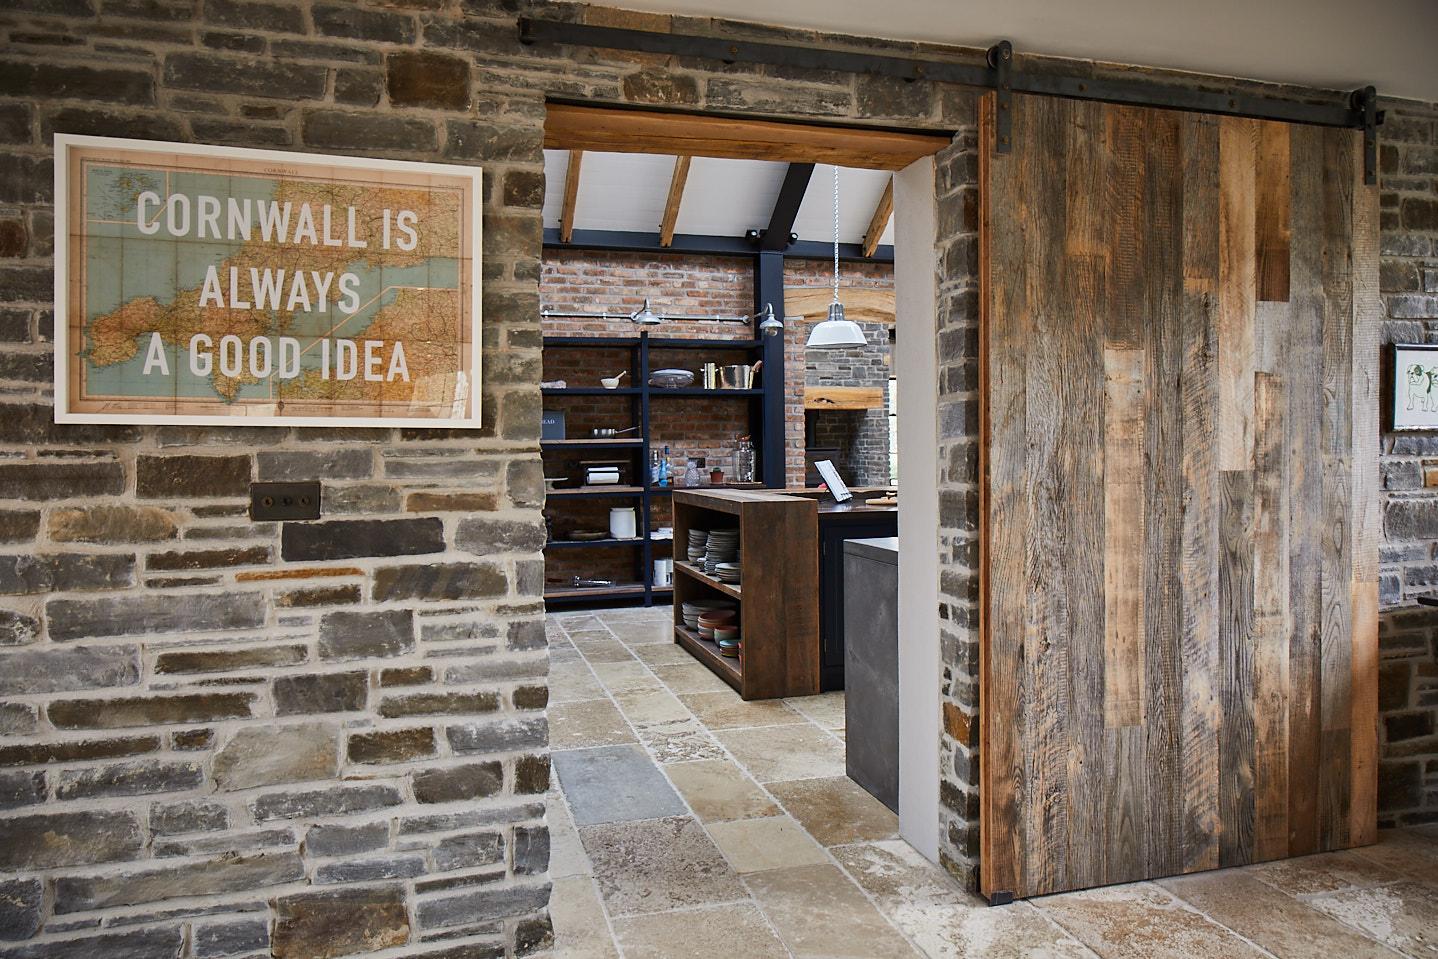 Cornwall is always a good idea sign with The Main Company sliding barn door